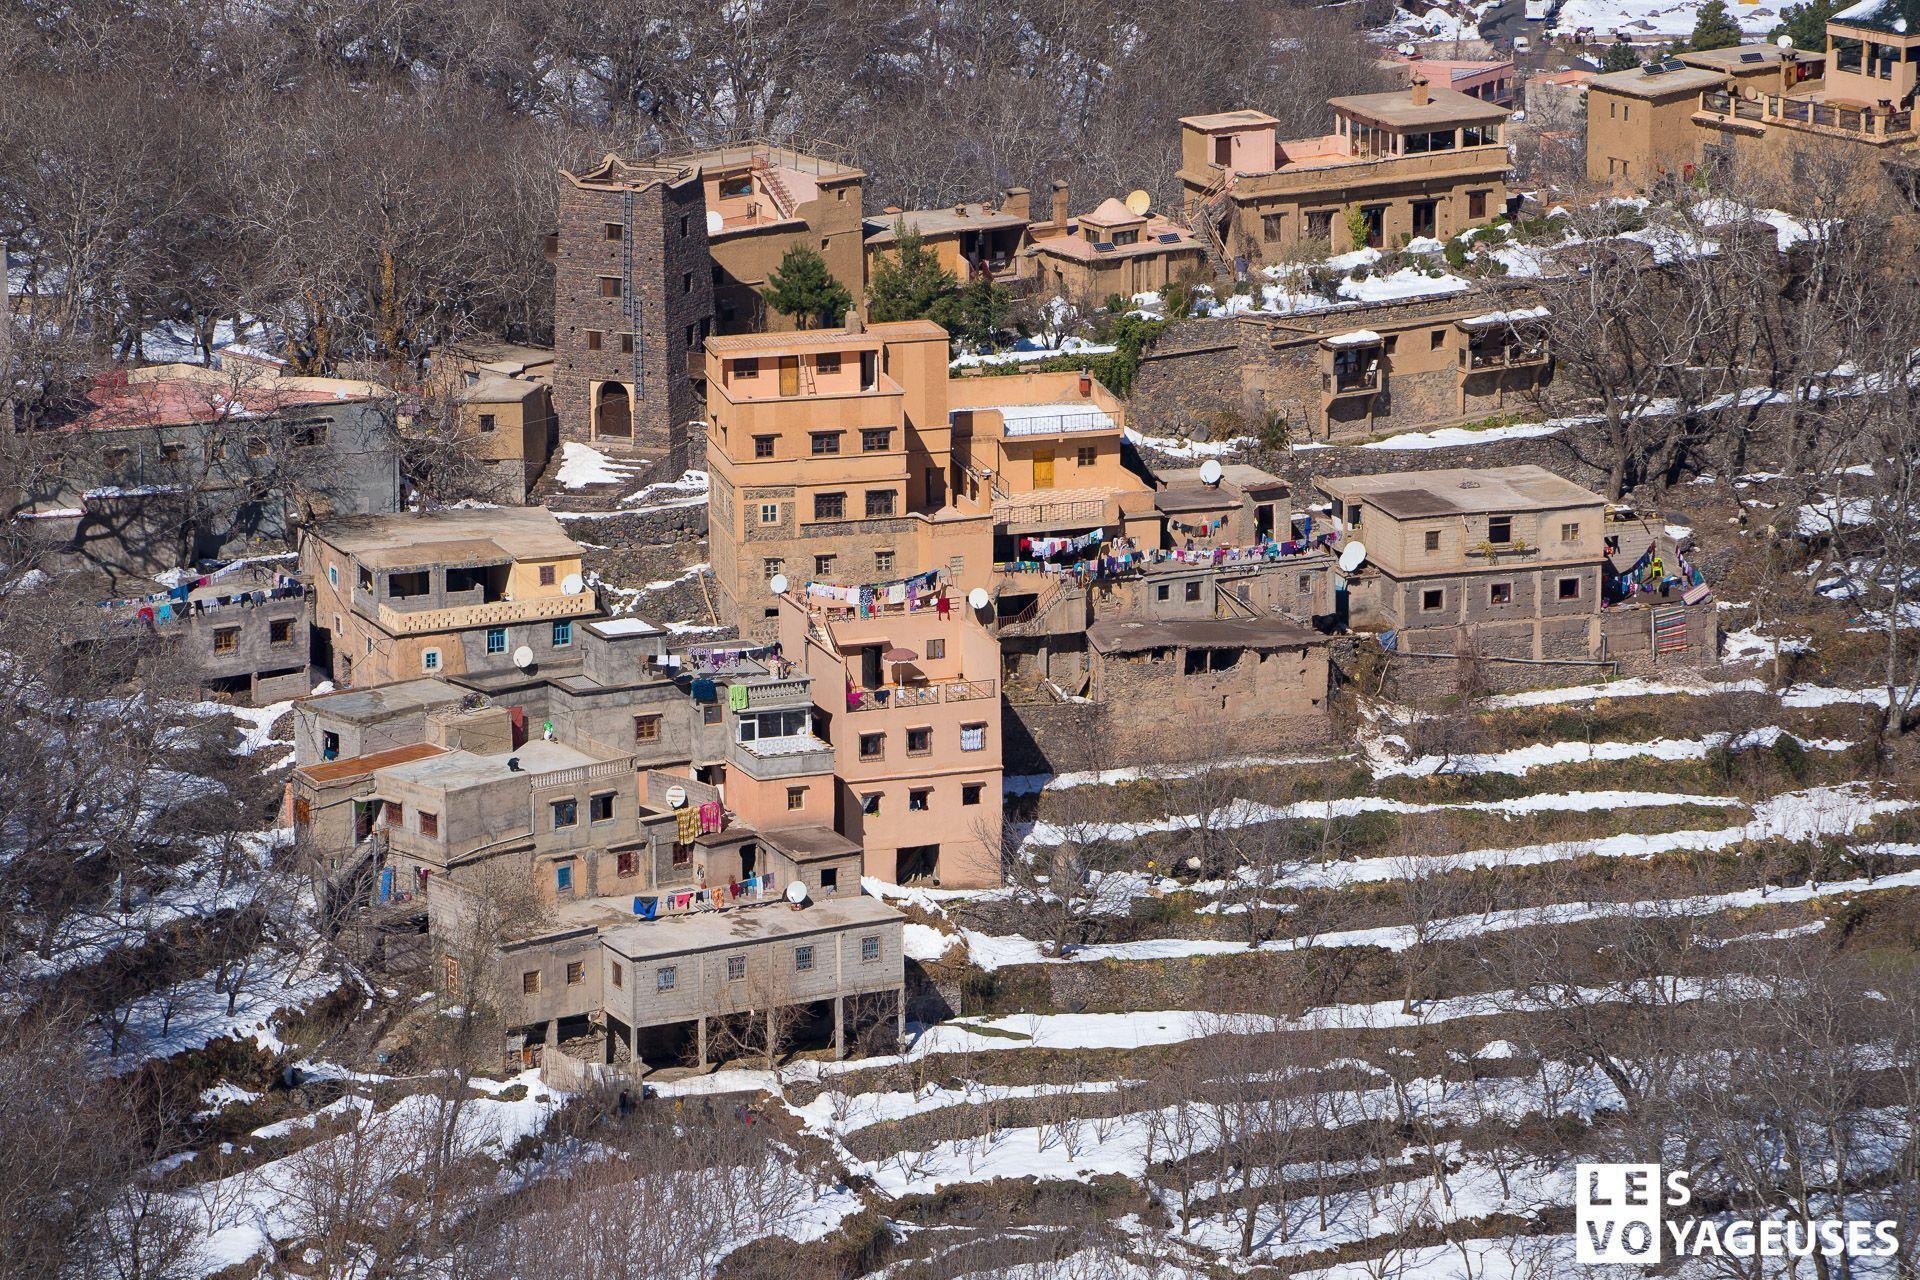 Les-voyageuses-maroc-imlil-hiver-09983